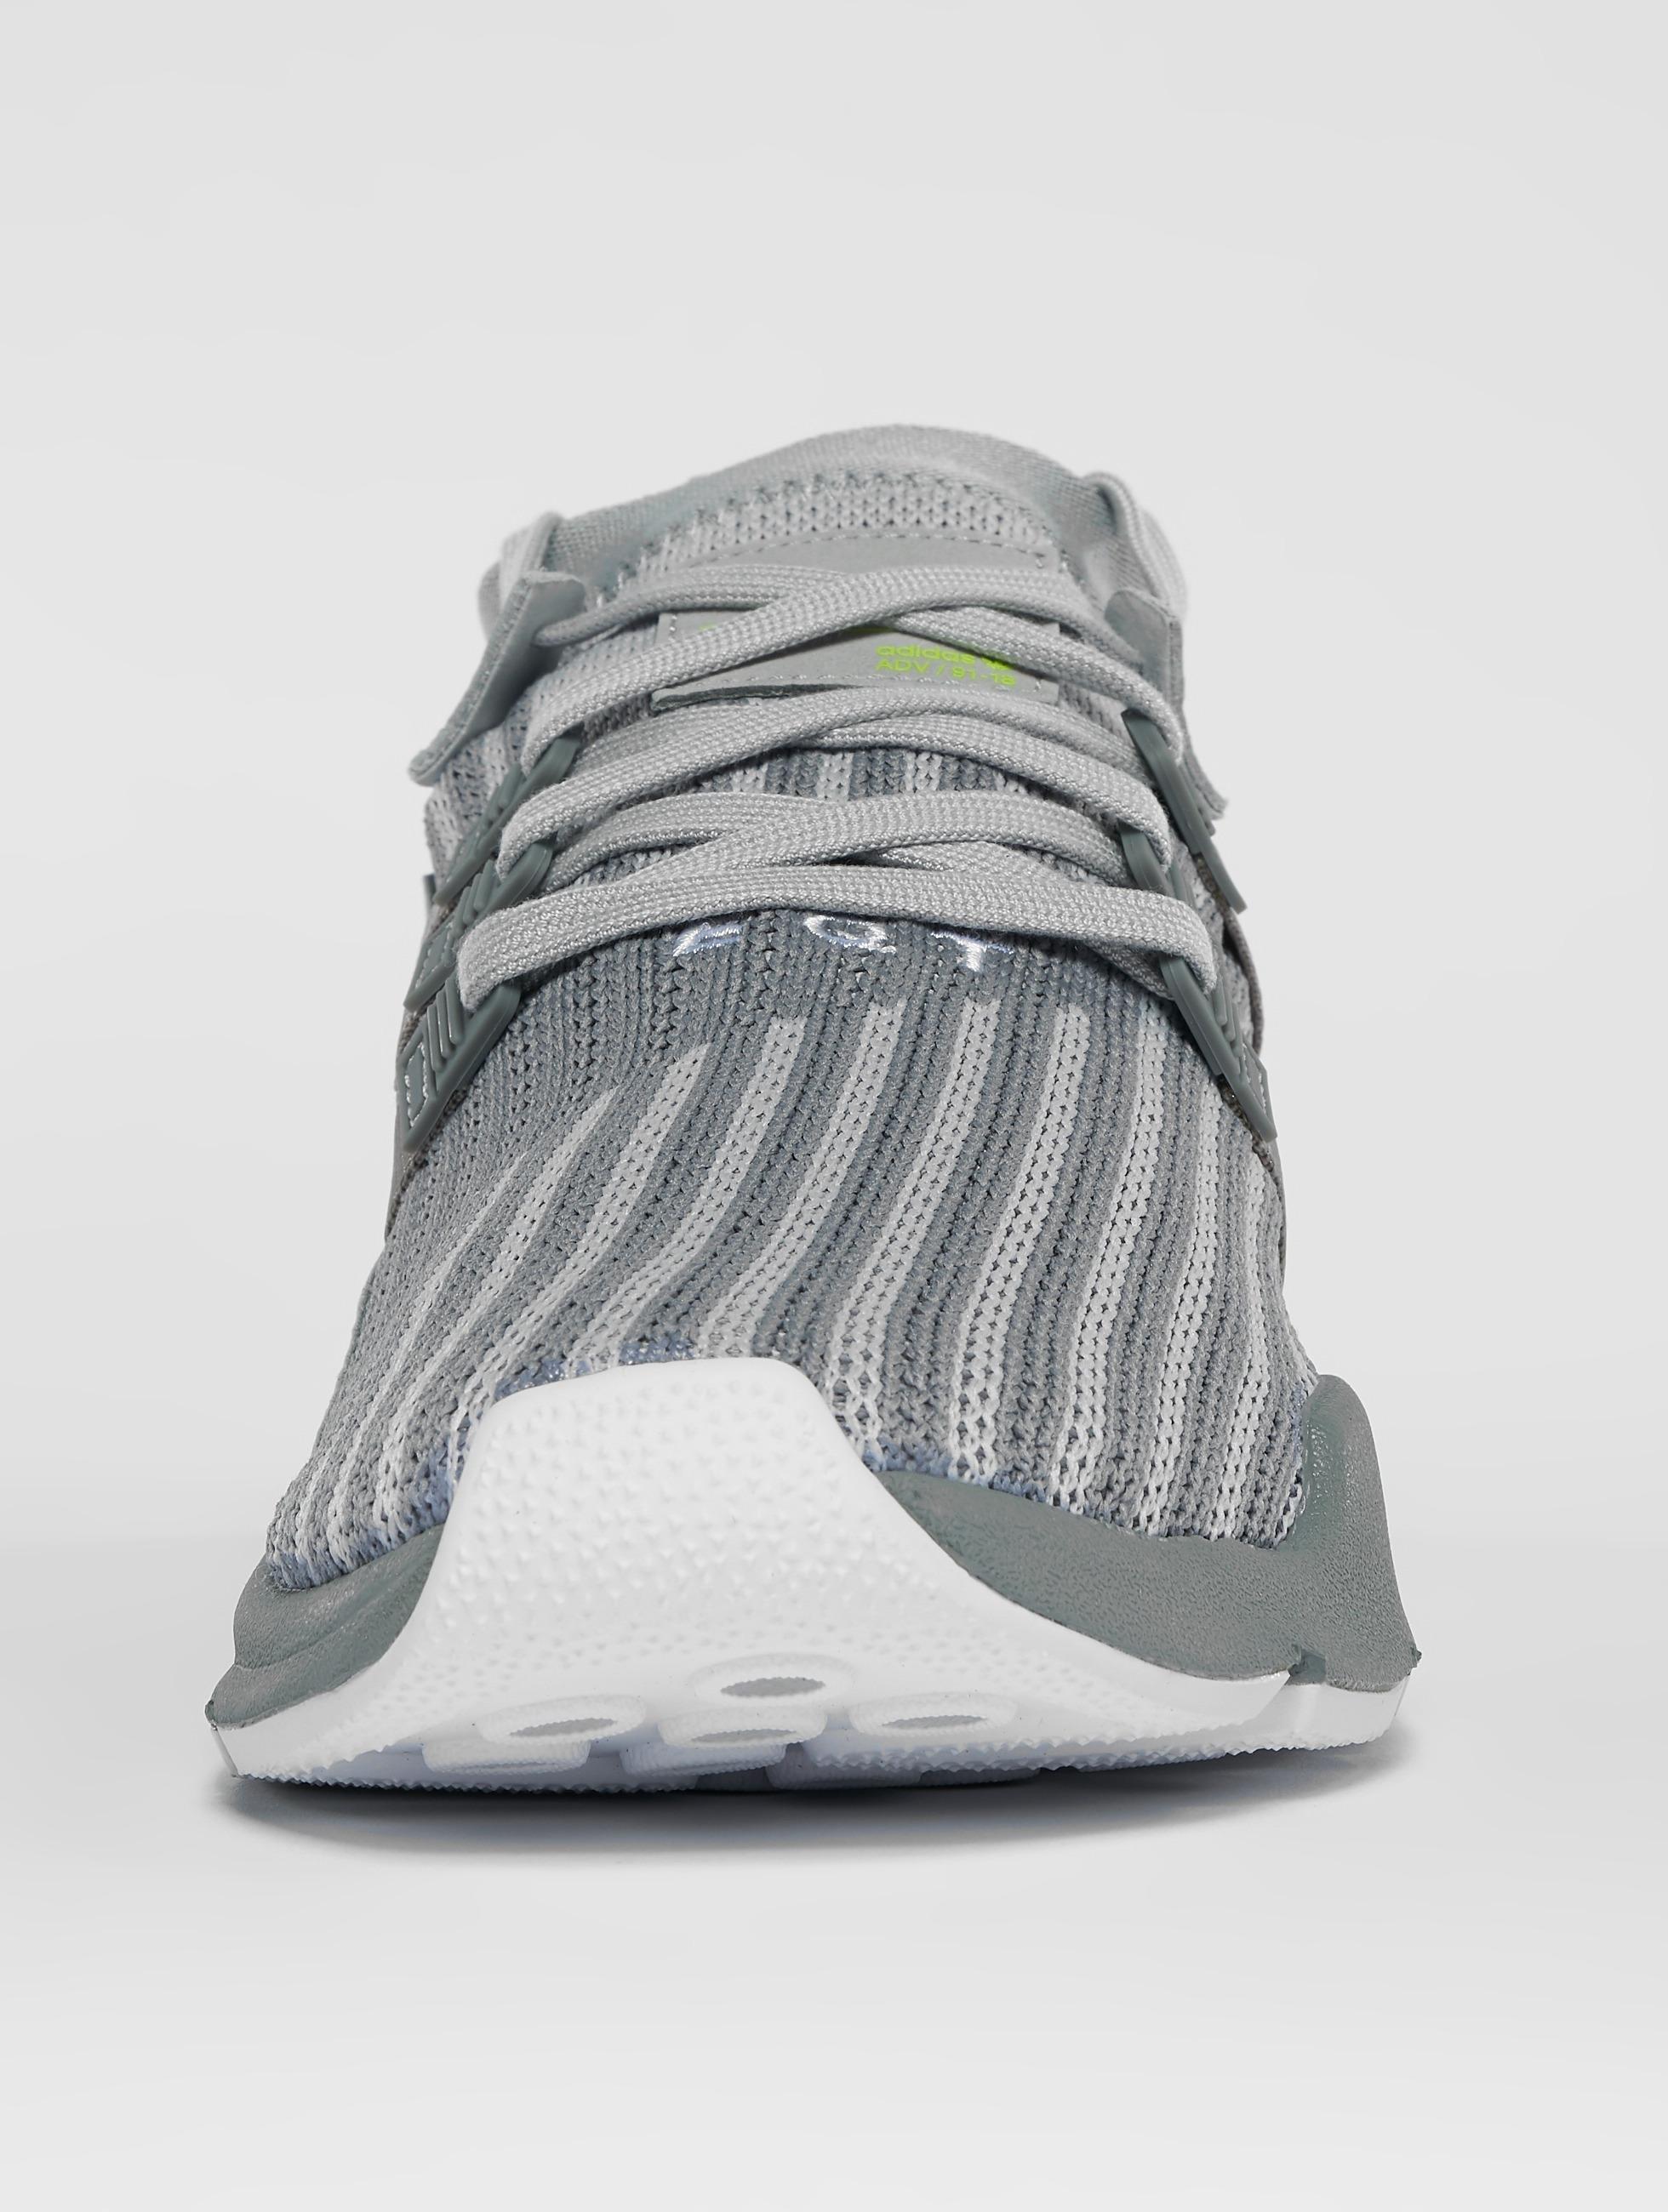 Mid Homme Adidas Eqt Originals Support Chaussures Baskets Adv qxZvxzC